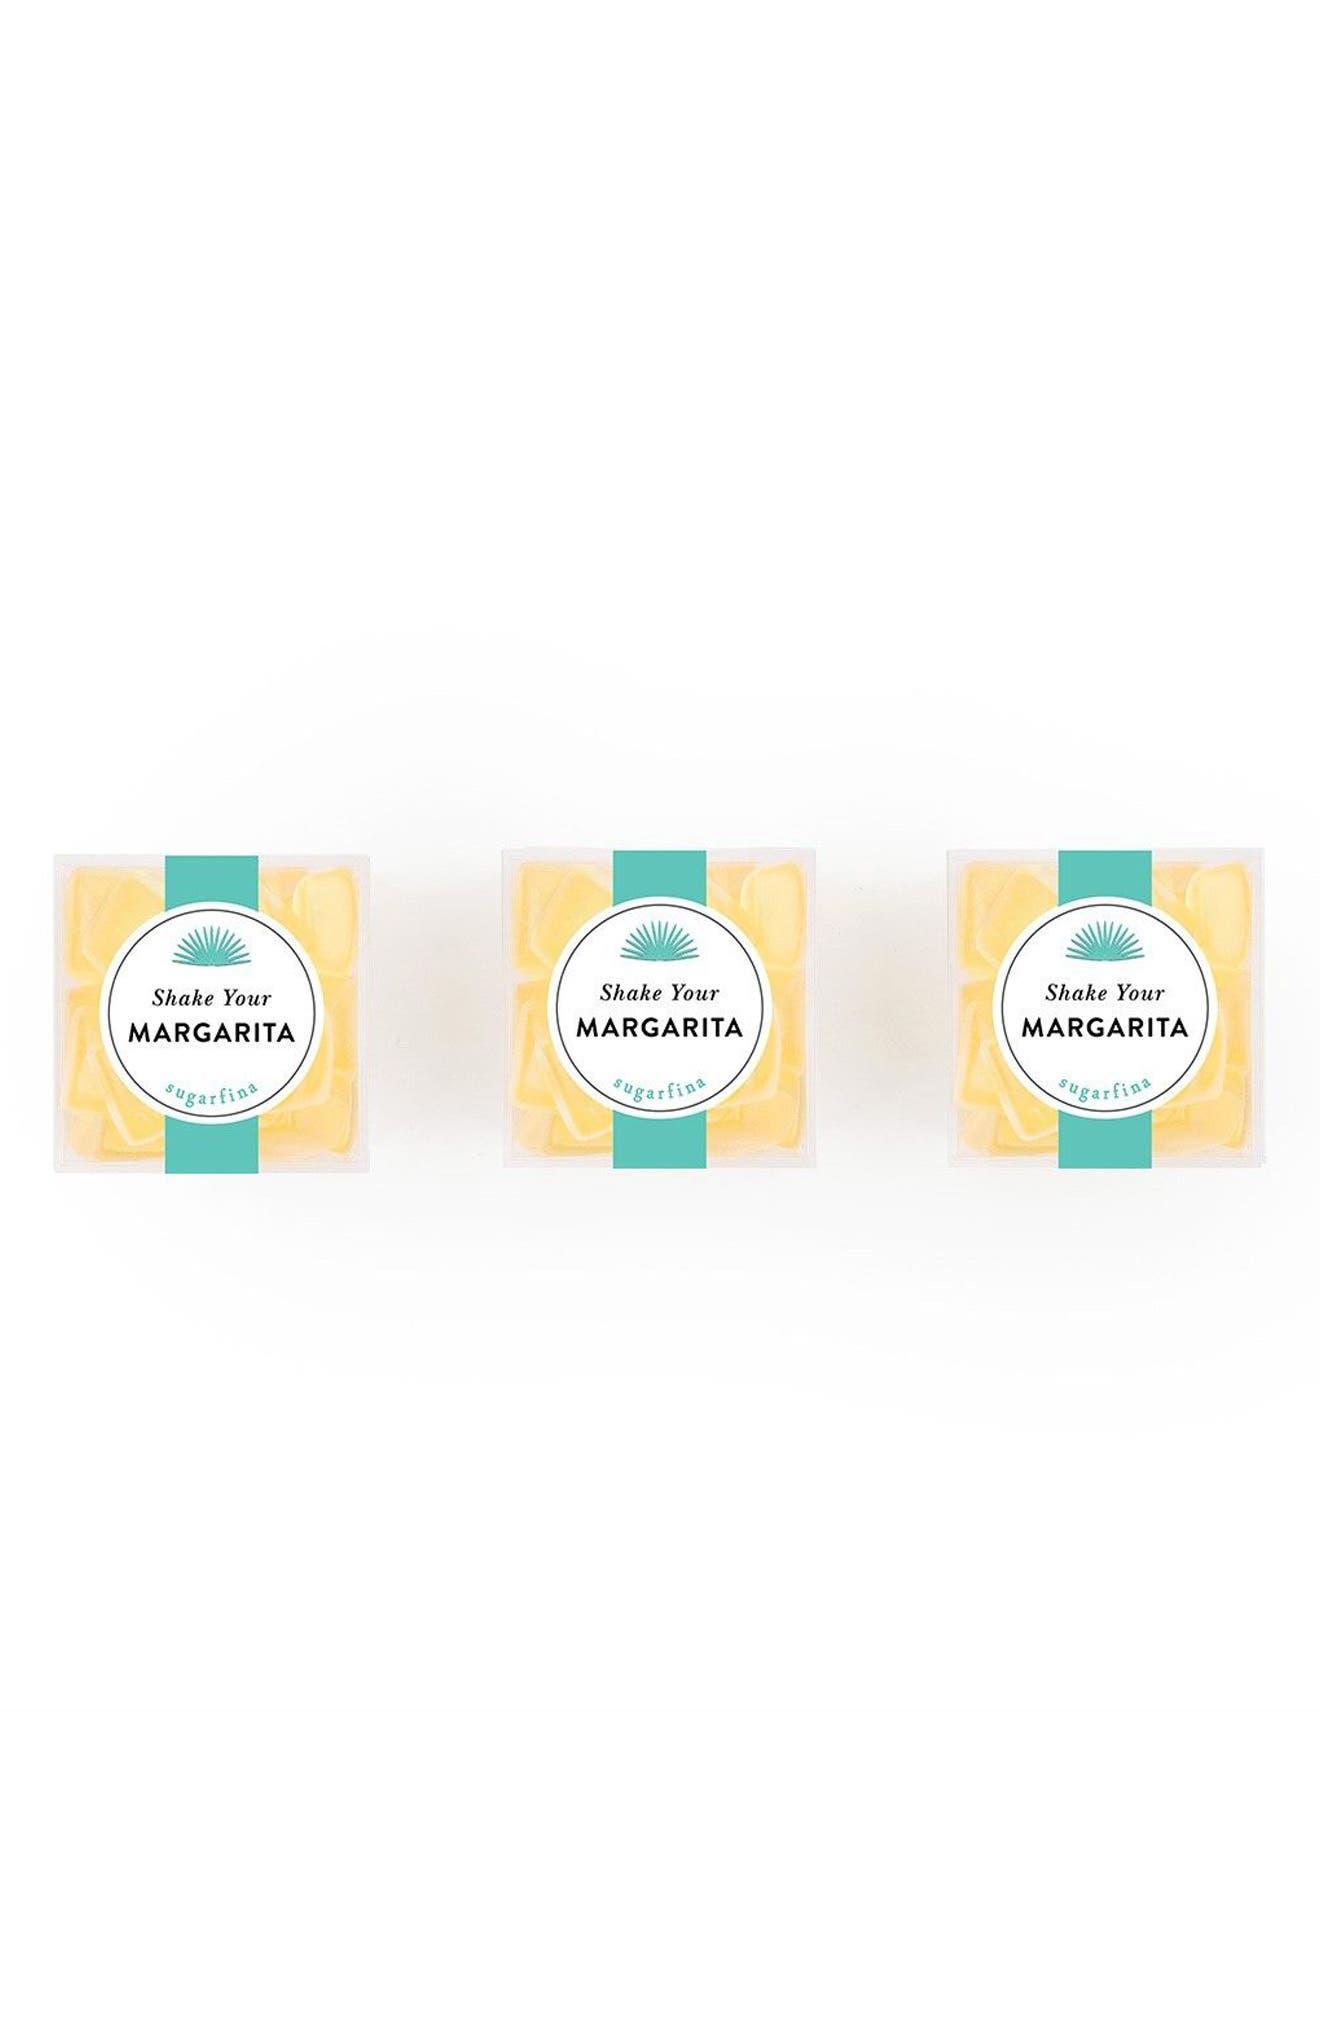 Casamigos - Shake Your Margarita Tequila Gummy Gift Set,                         Main,                         color, Yellow